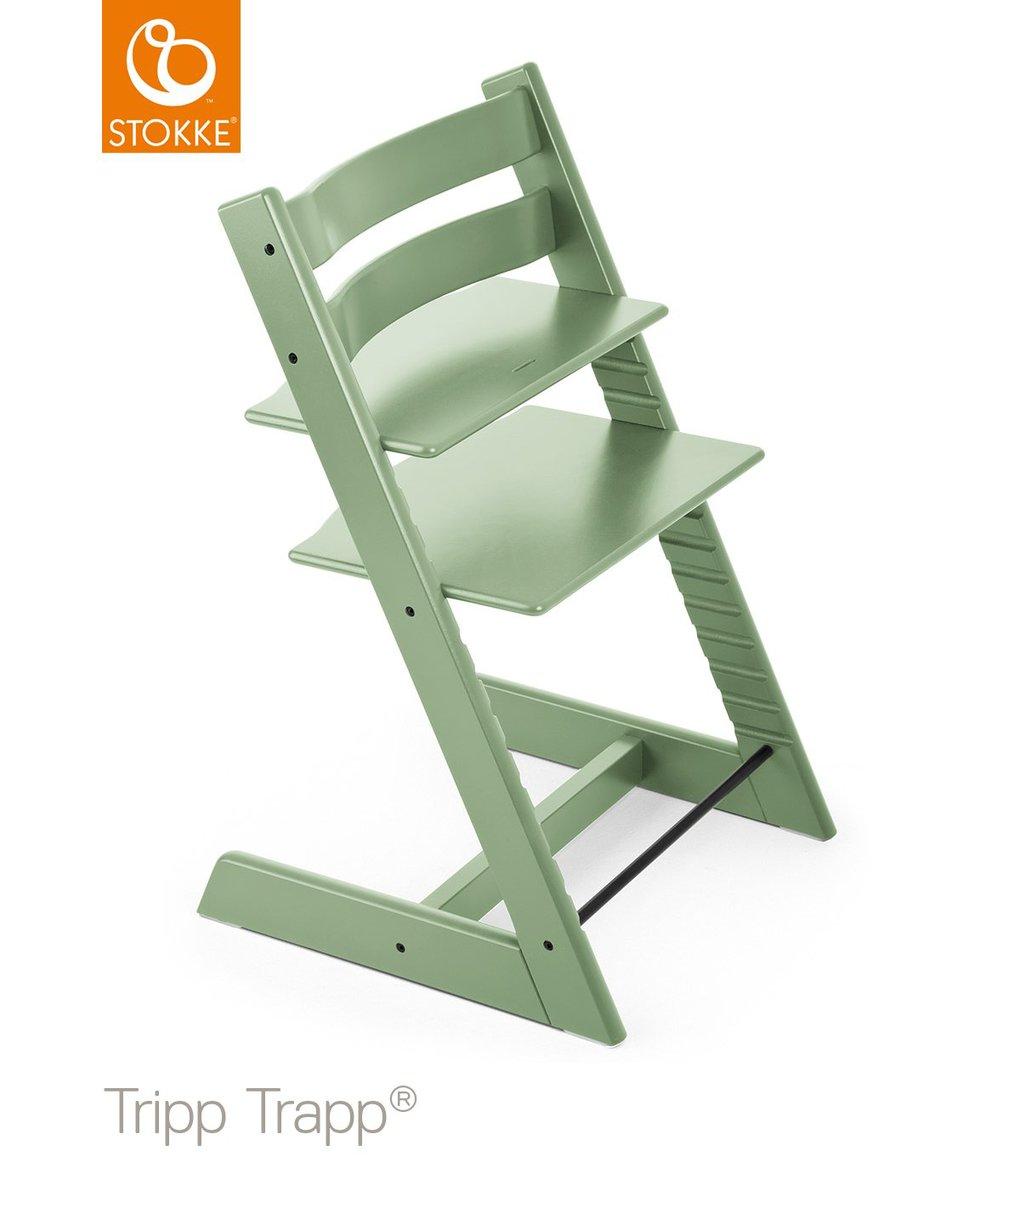 Tripp trapp® - verde musgo - Stokke